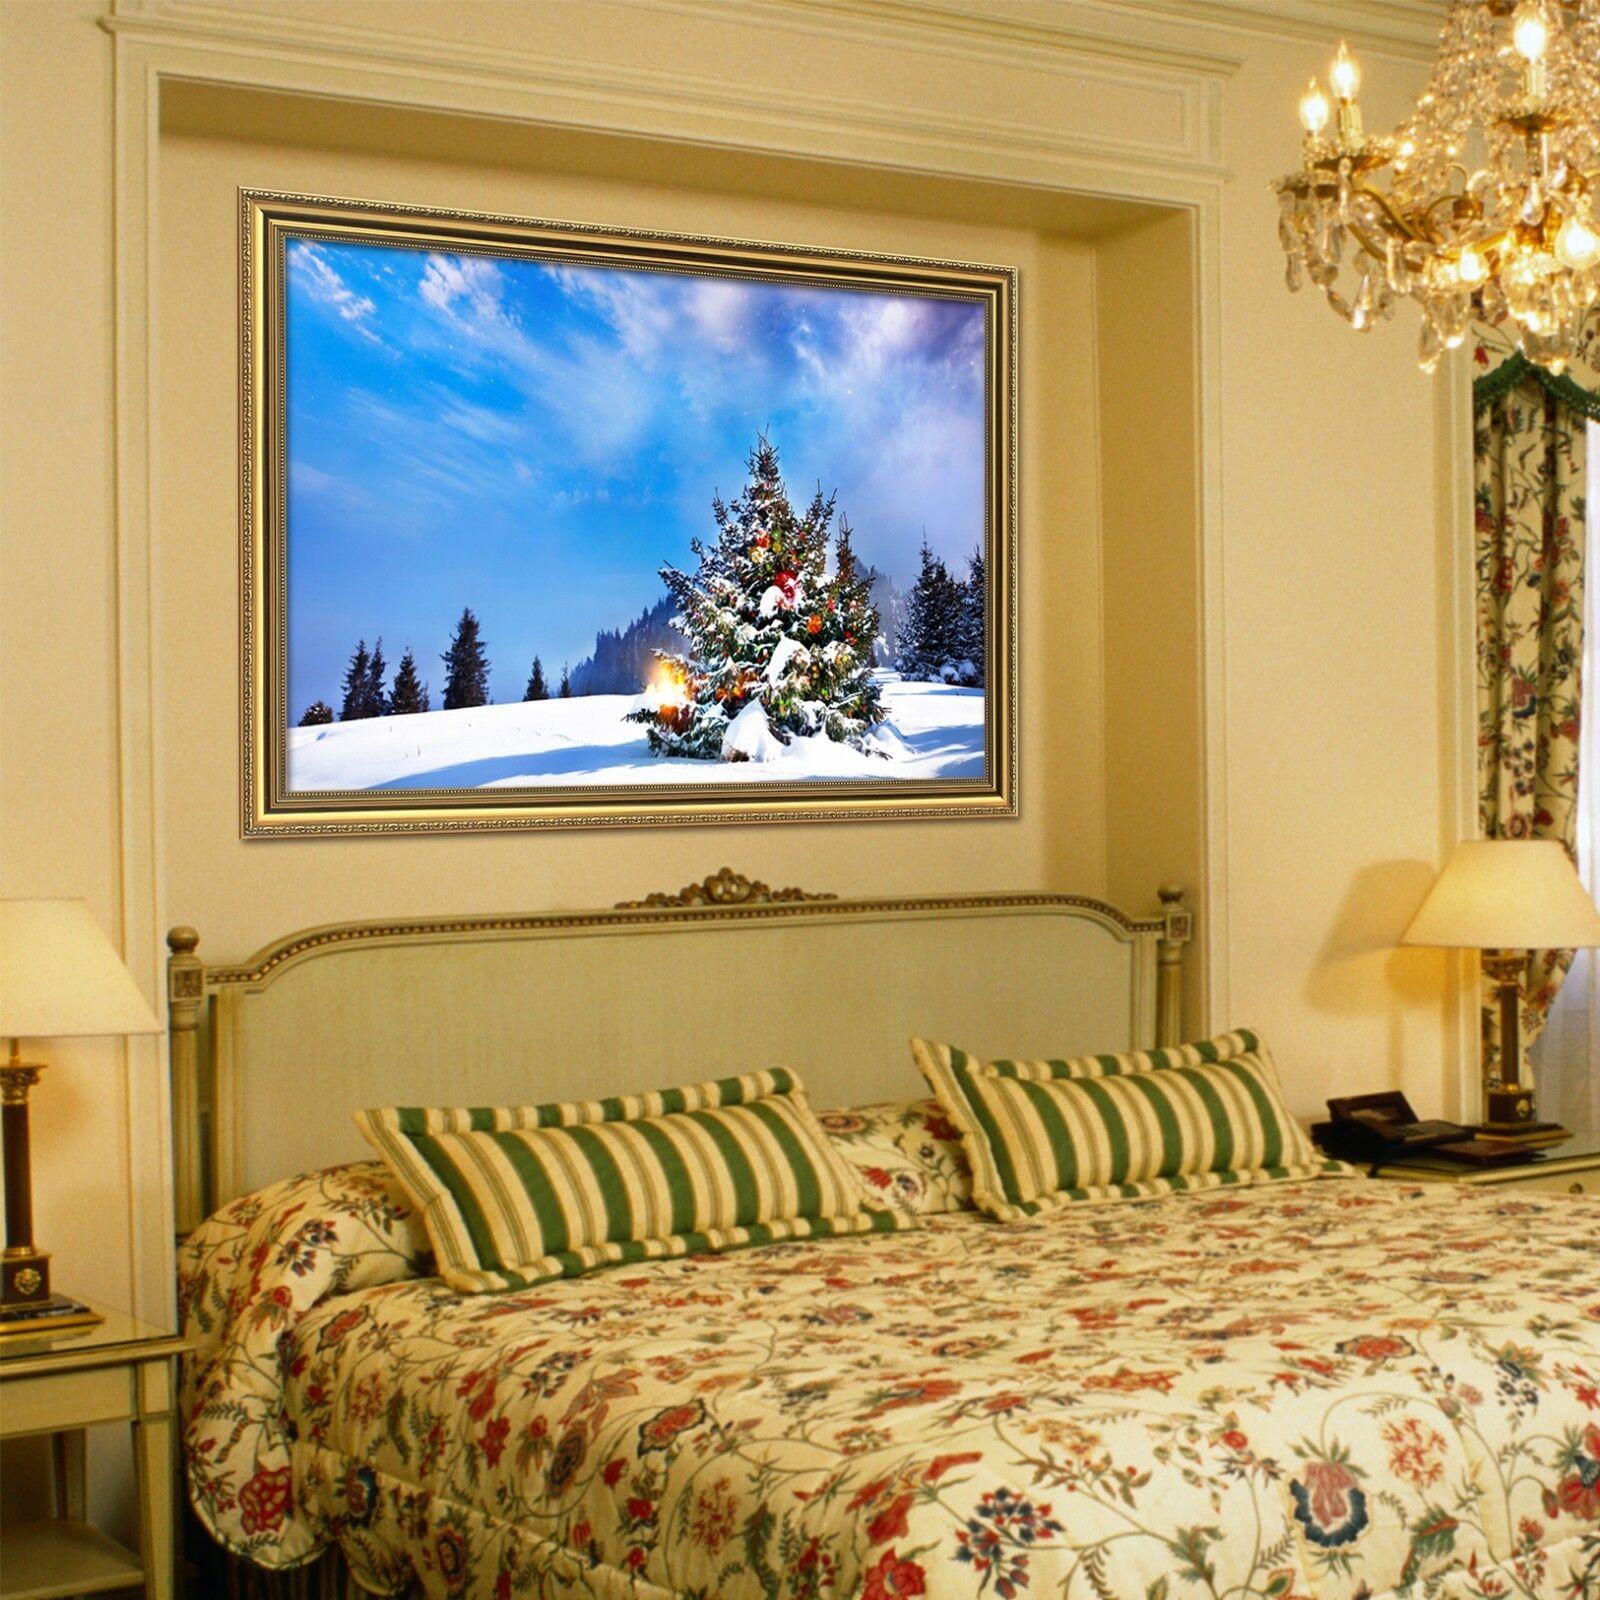 3D Christmas Tree 6 Framed Poster Home Decor Print Painting Art AJ WALLPAPER AU